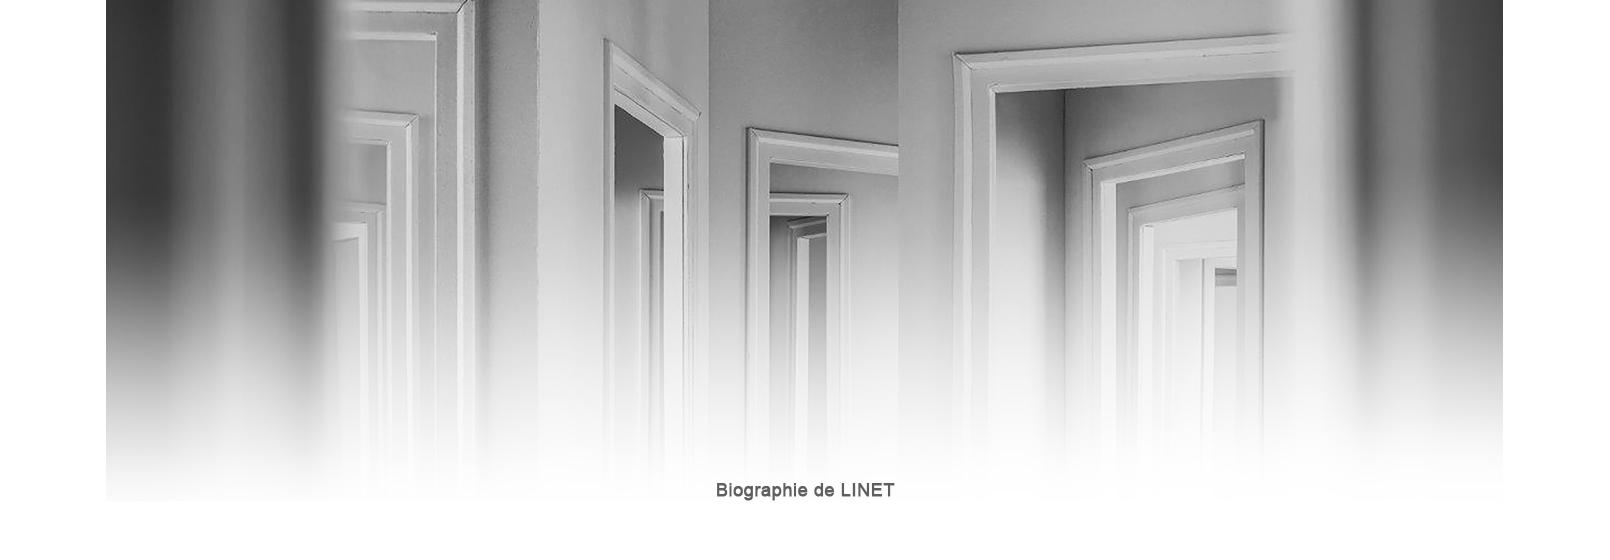 linet-bio.jpg